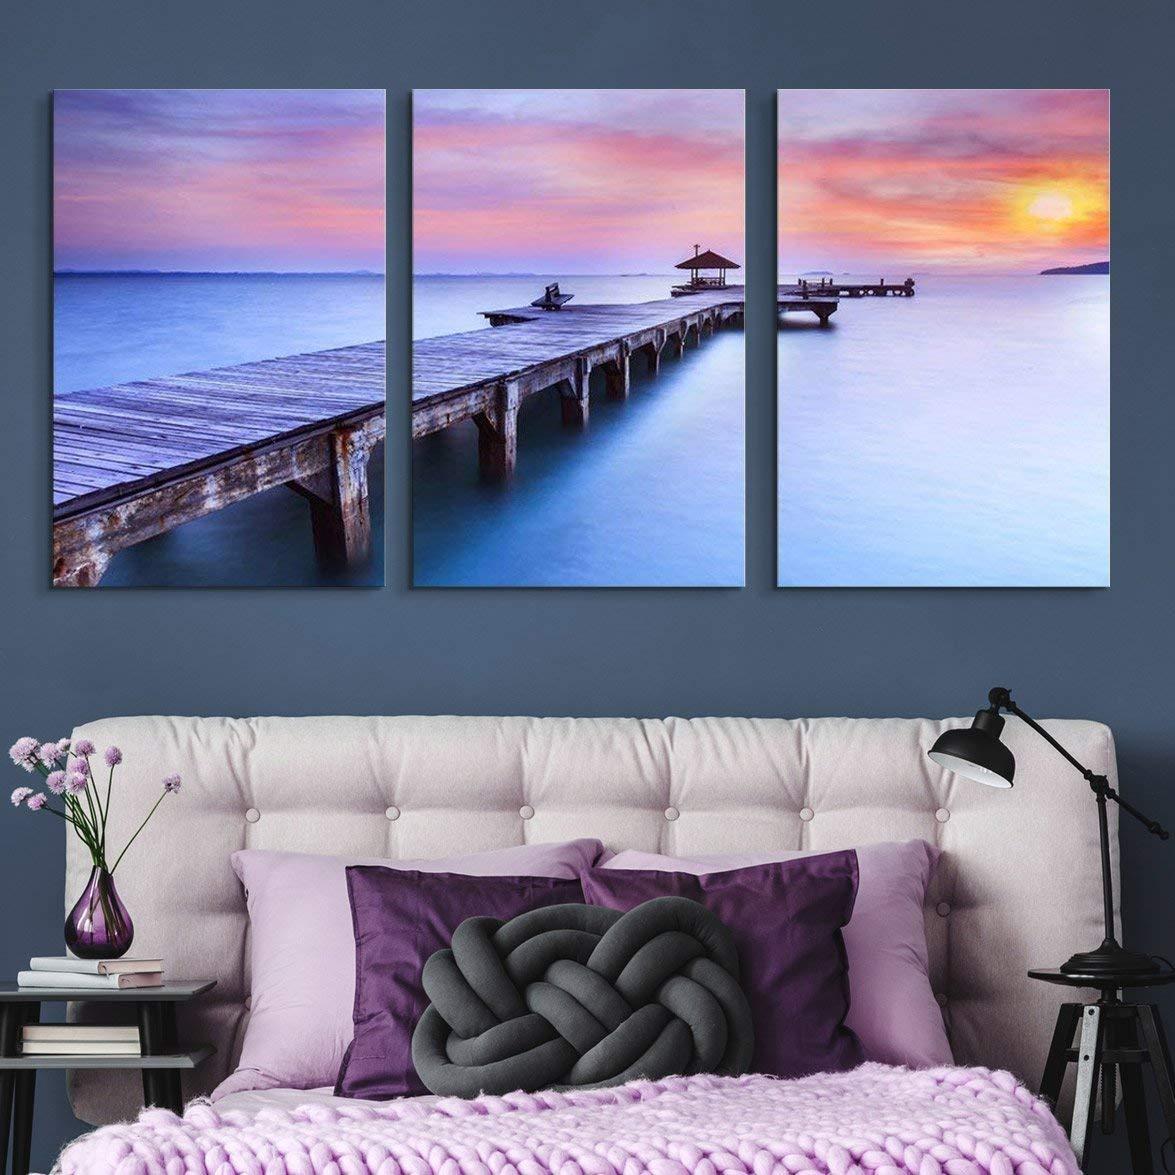 NWT 3 Piece Canvas Wall Art Long Bridge Ocean Sunset Painting Artwork for Home Prints Framed 24 x 36 x 3 Panels CVS-ZONB-01-24x36x1.50x3